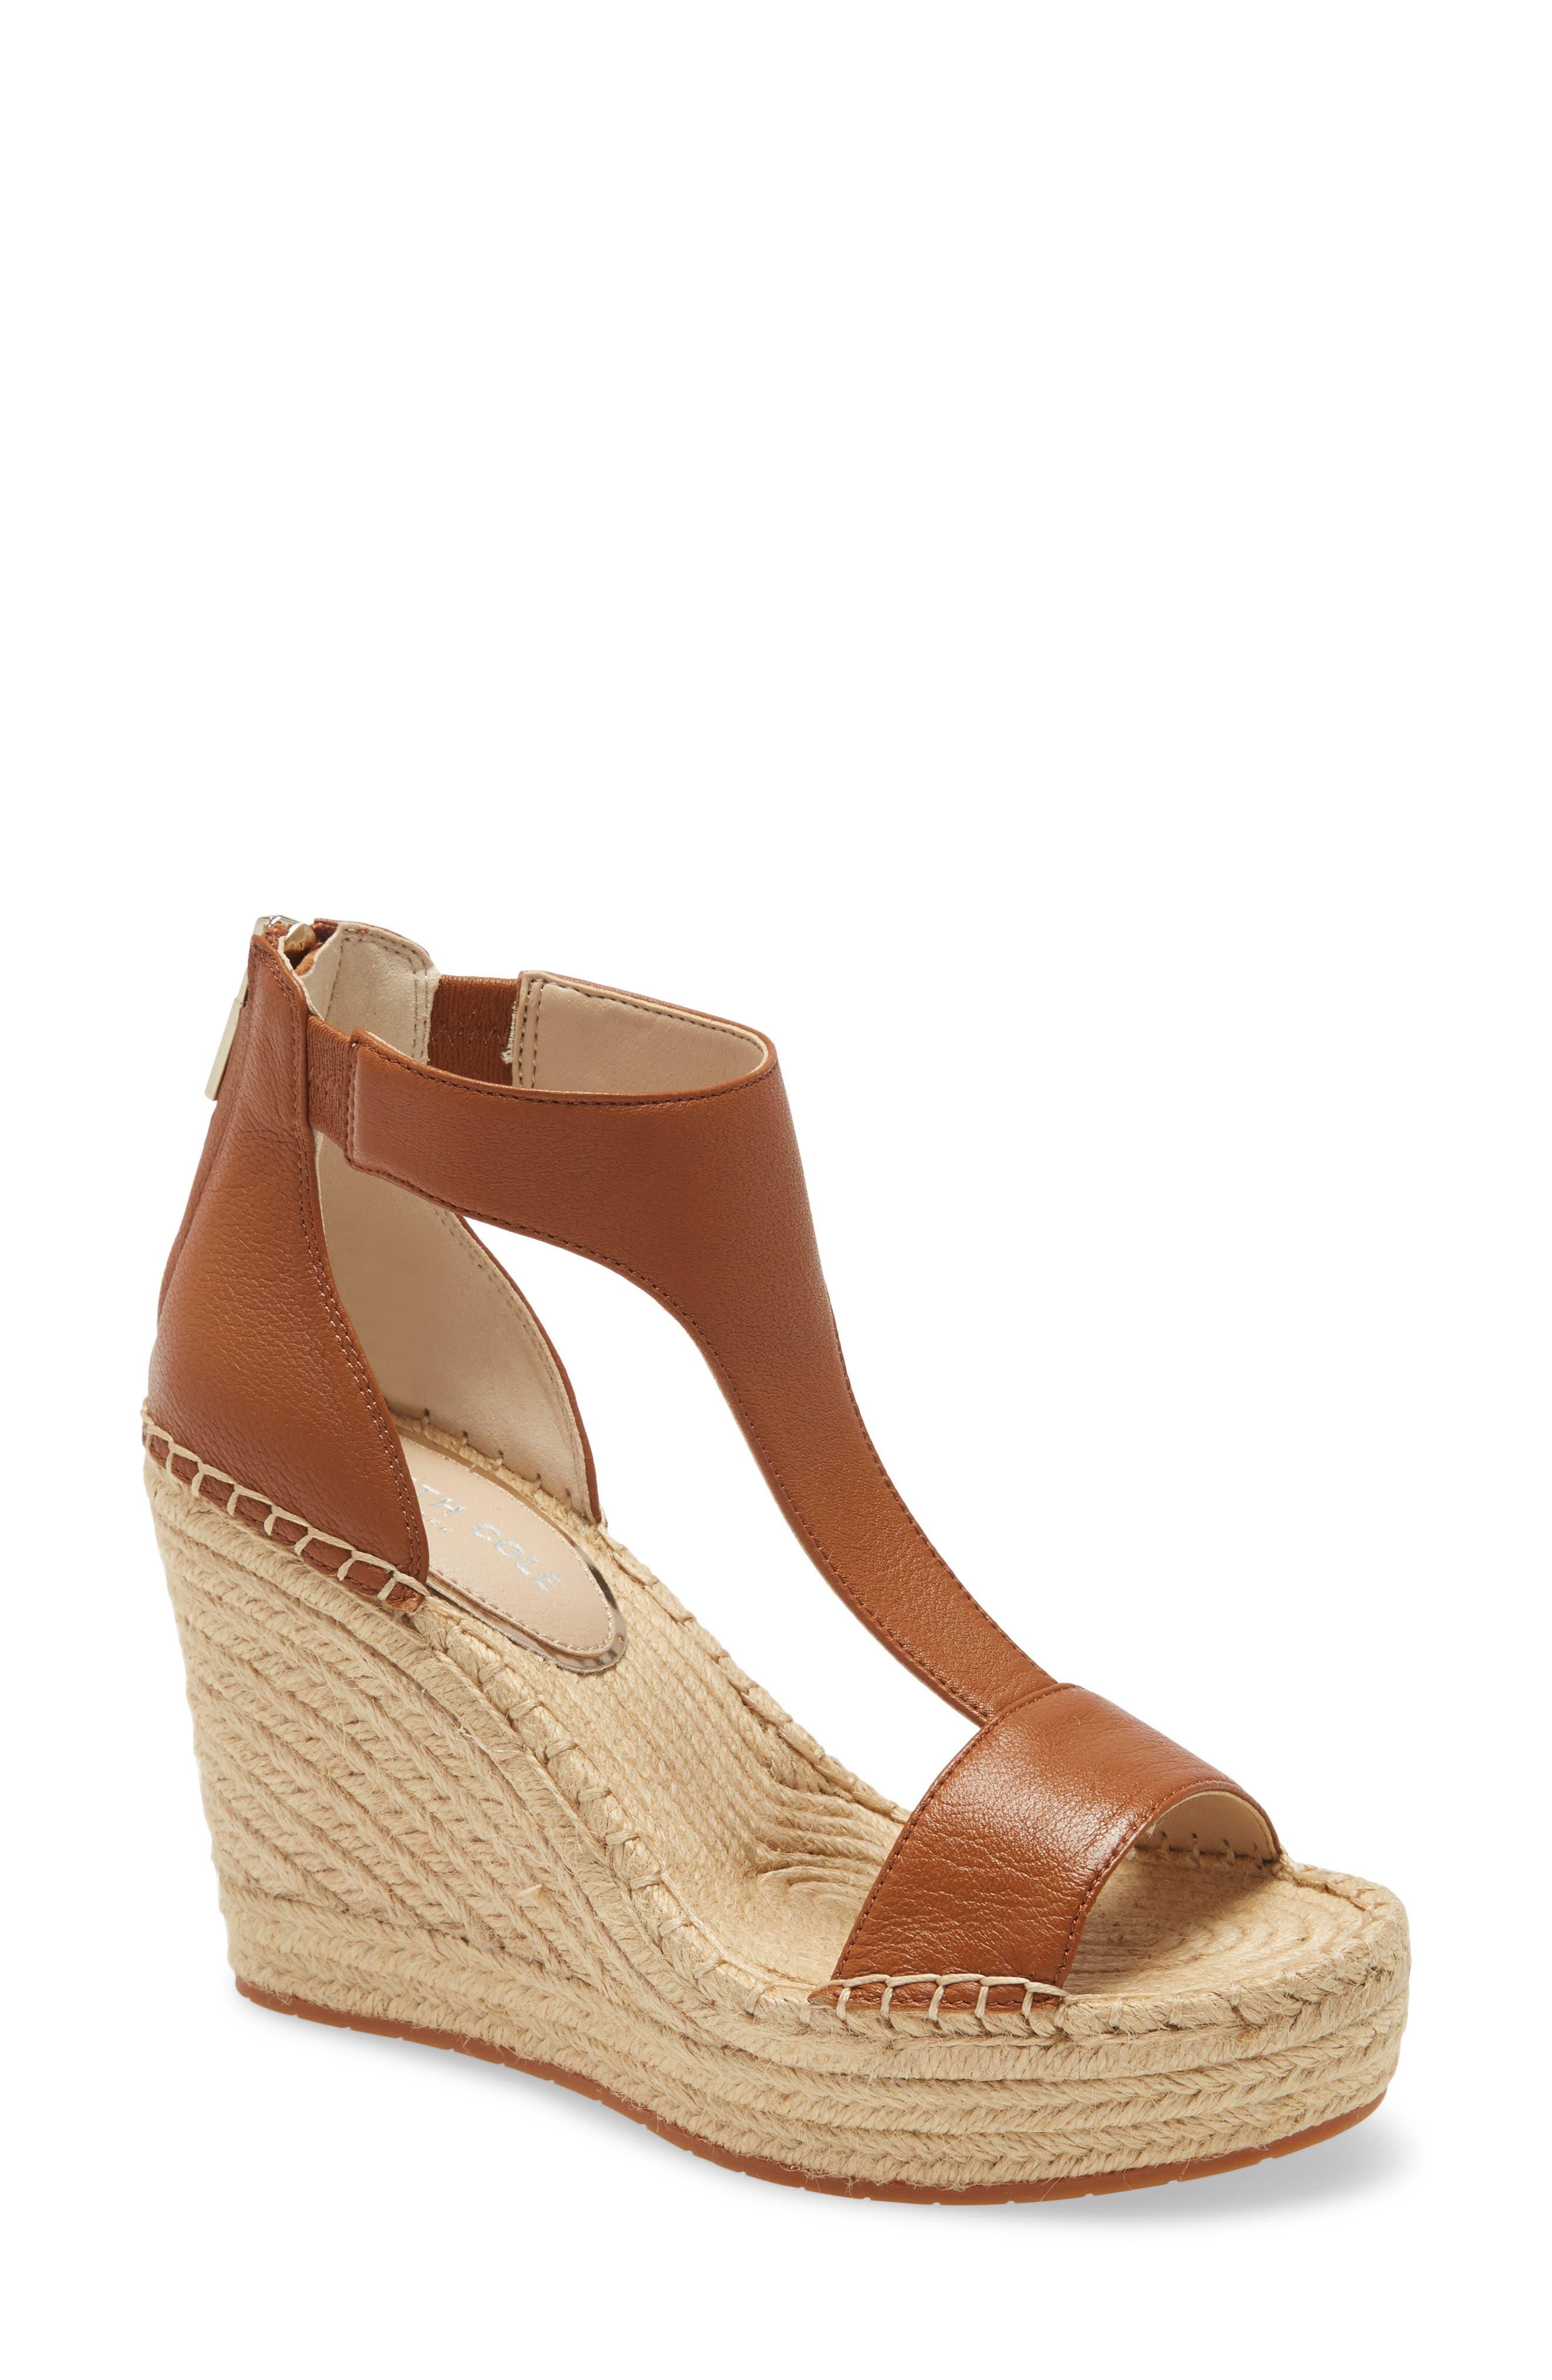 Olivia T-Strap Wedge Sandal